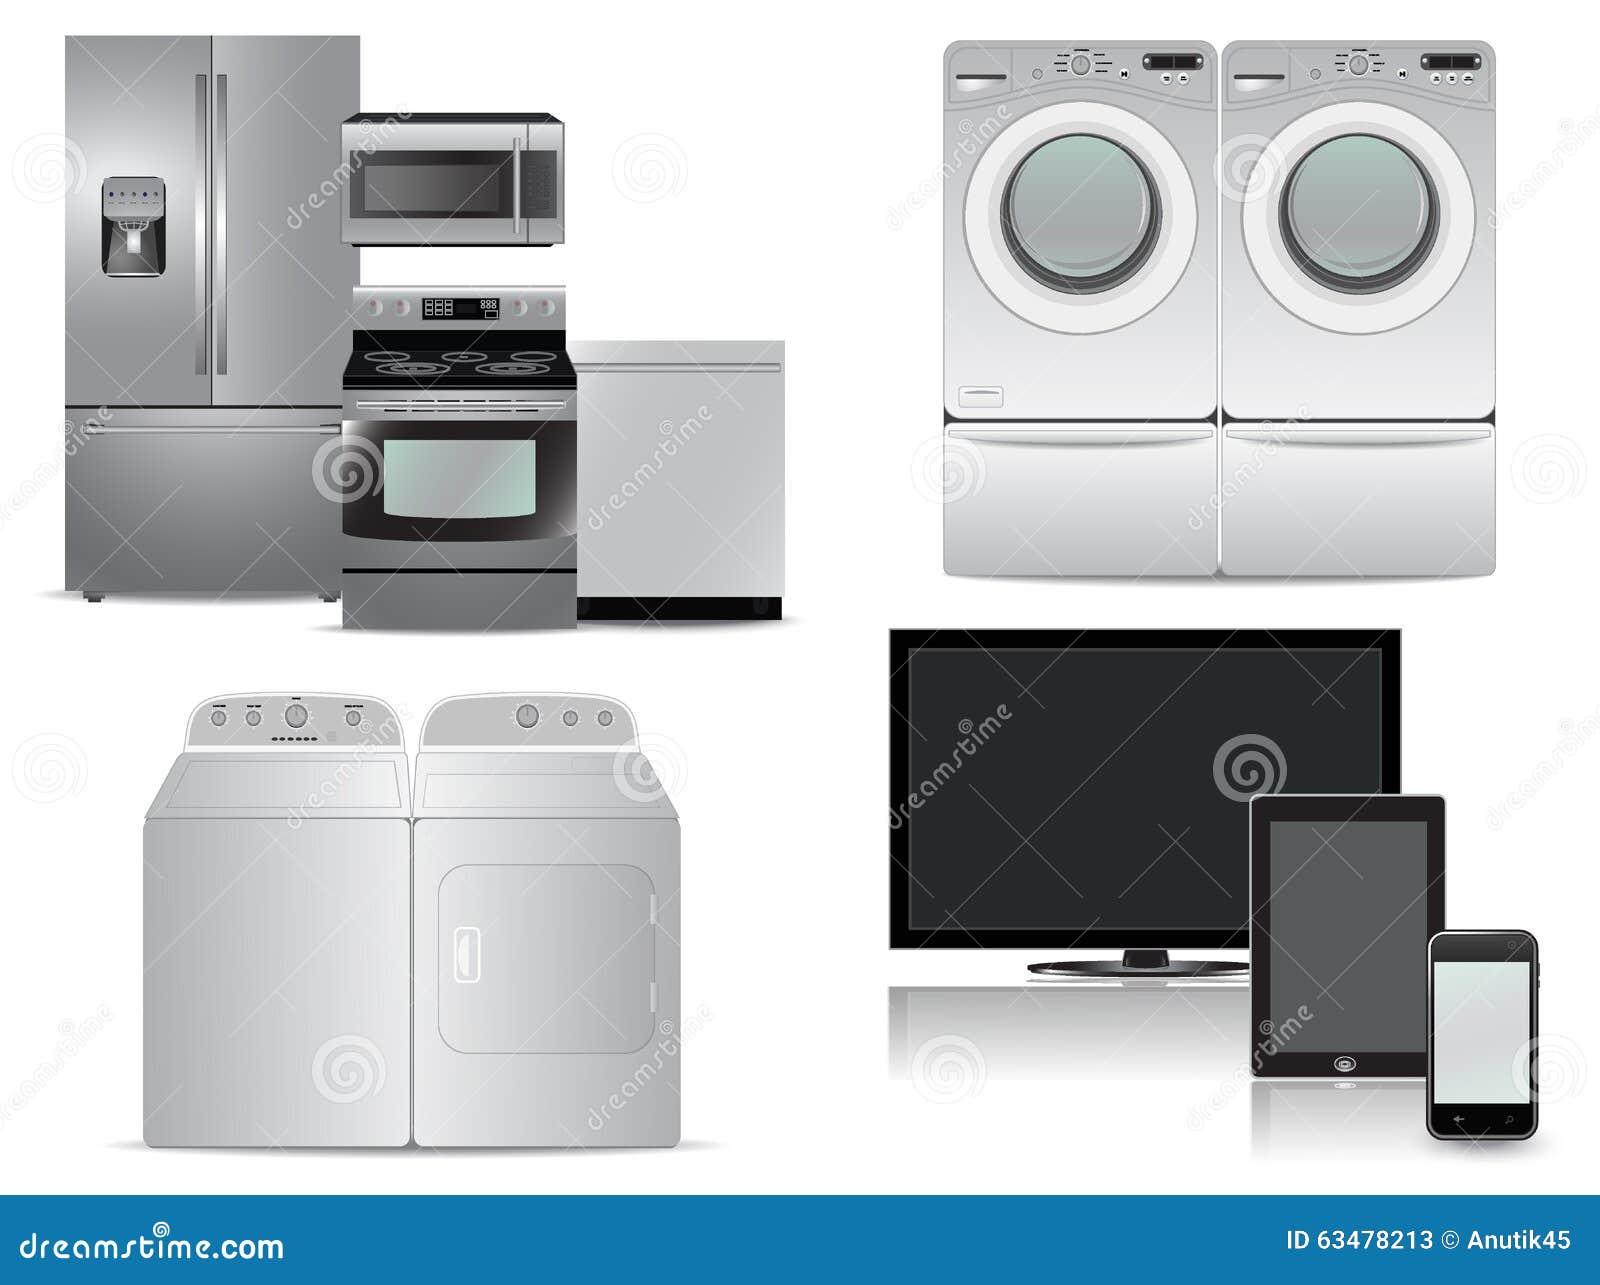 bundle kitchen appliance deal alldpic